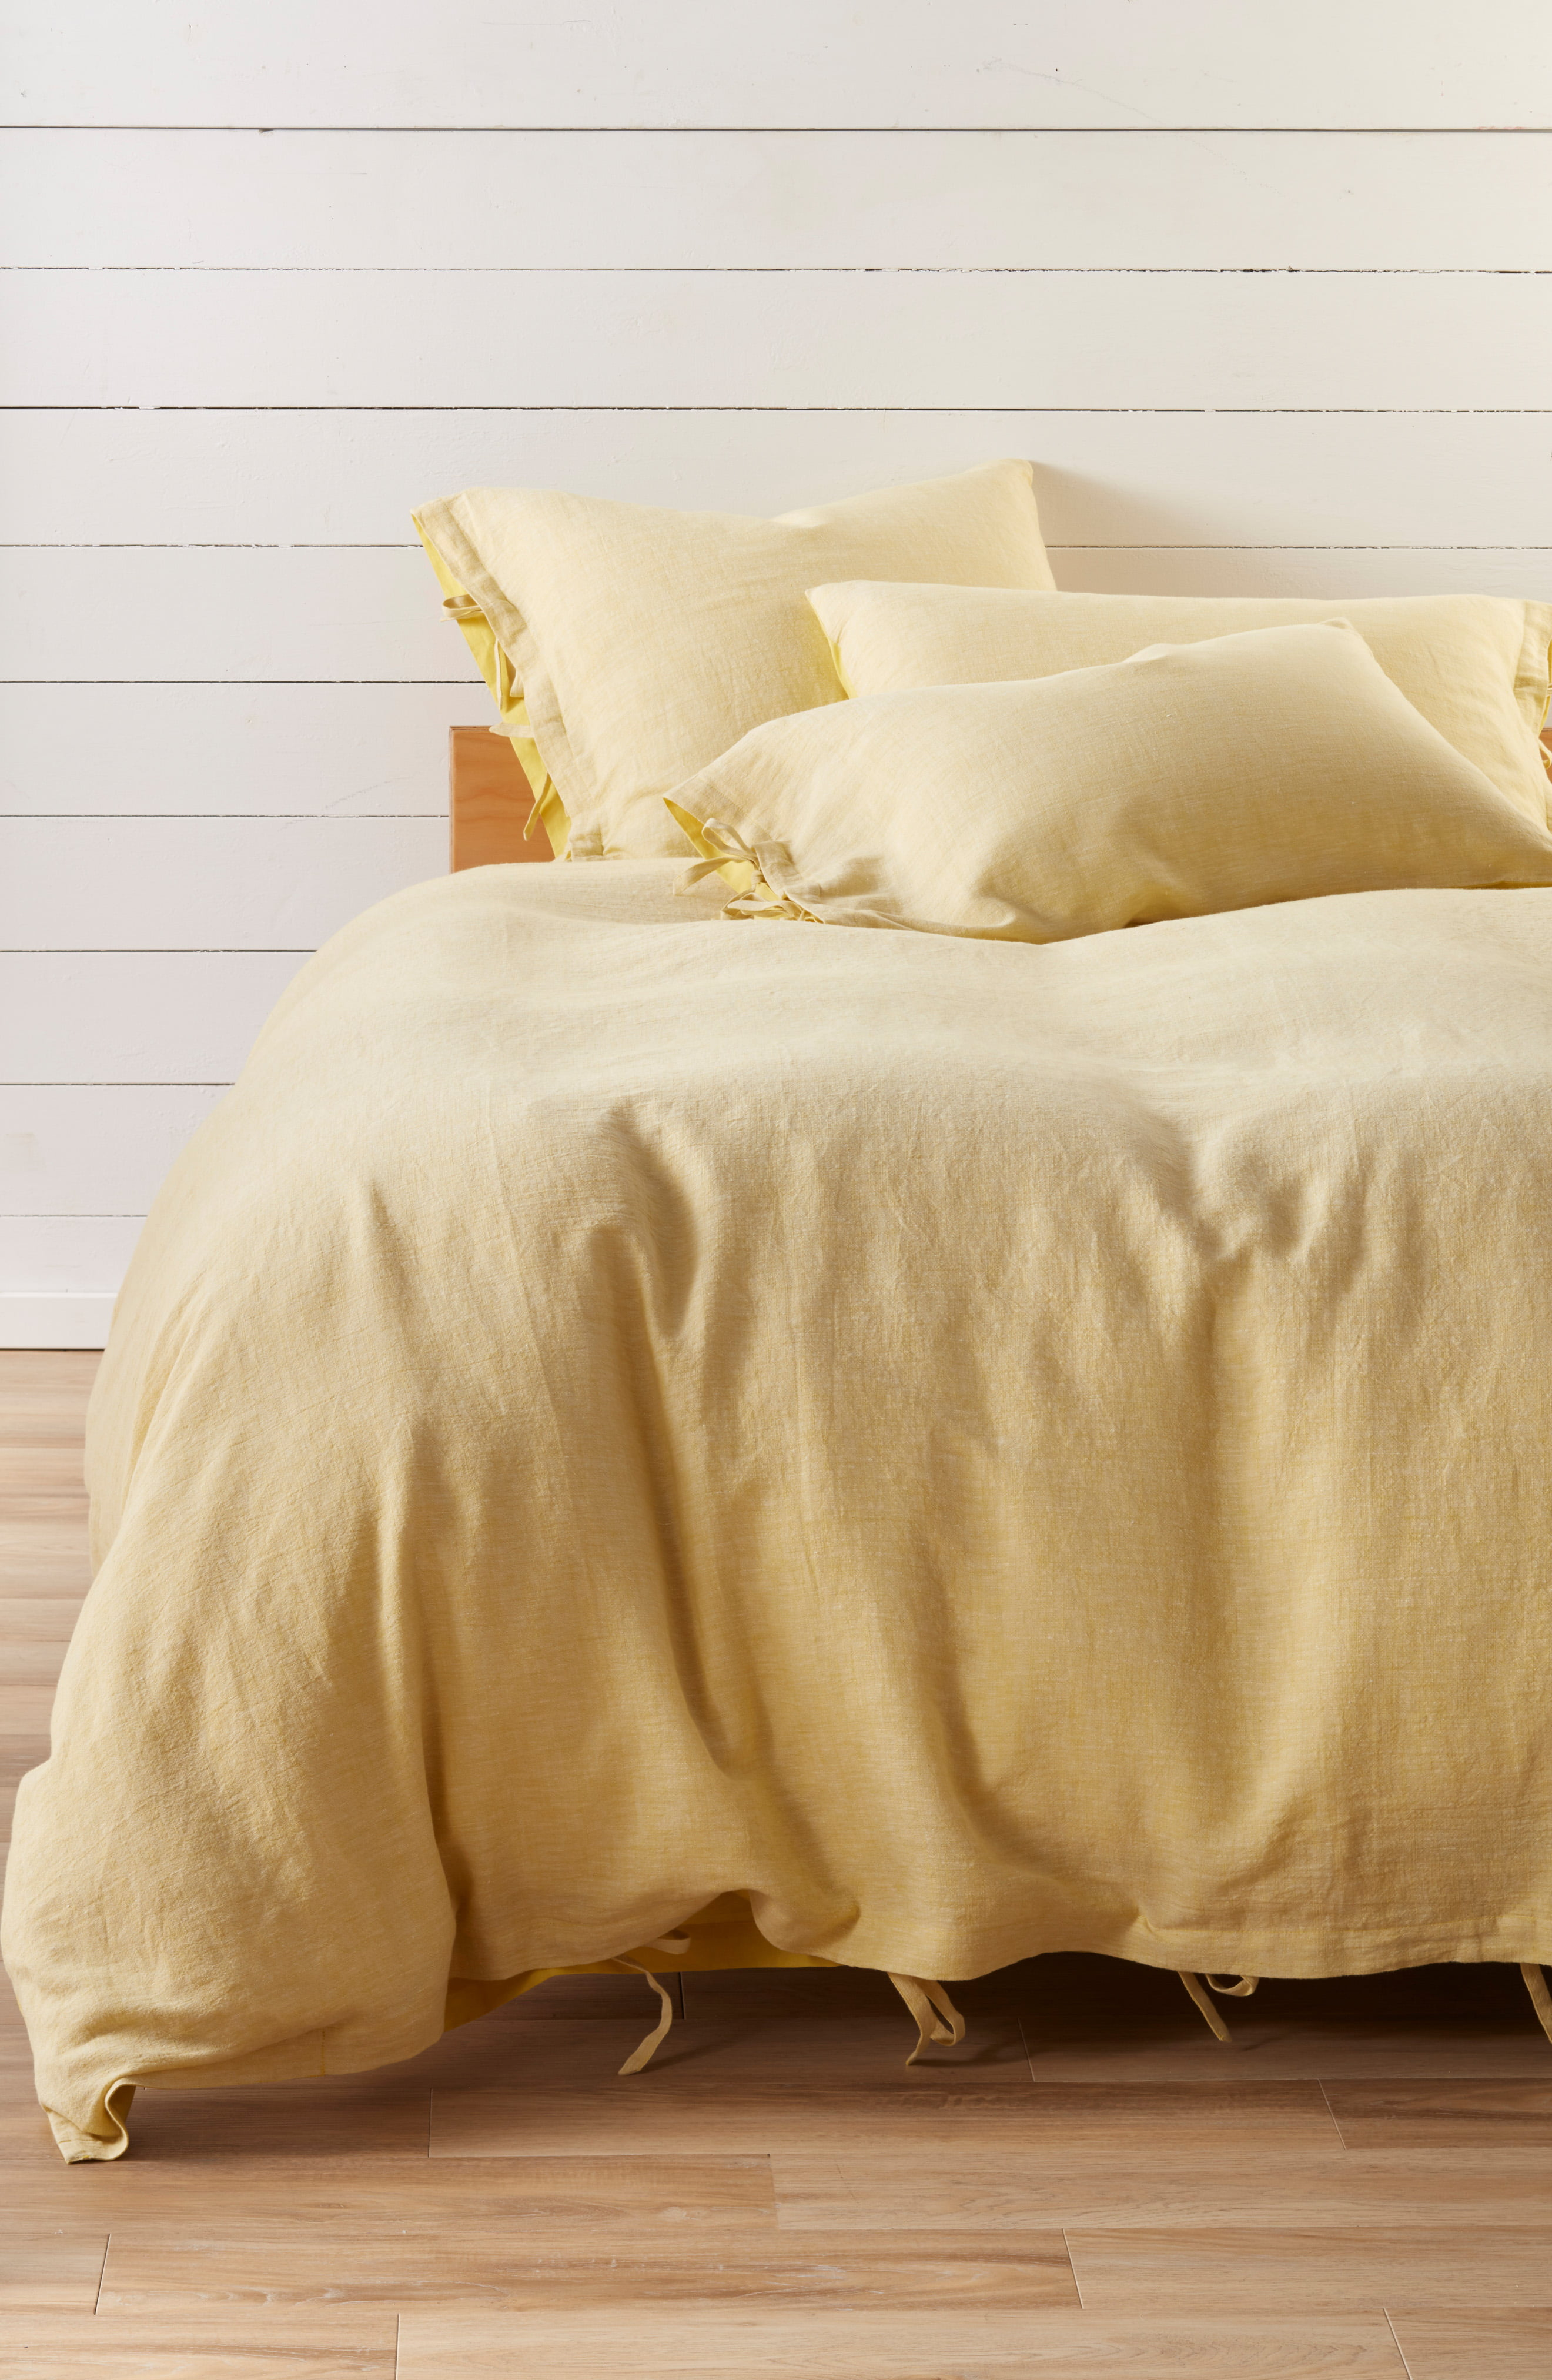 Treasure Bond Relaxed Cotton Linen Duvet Cover Bed Linen